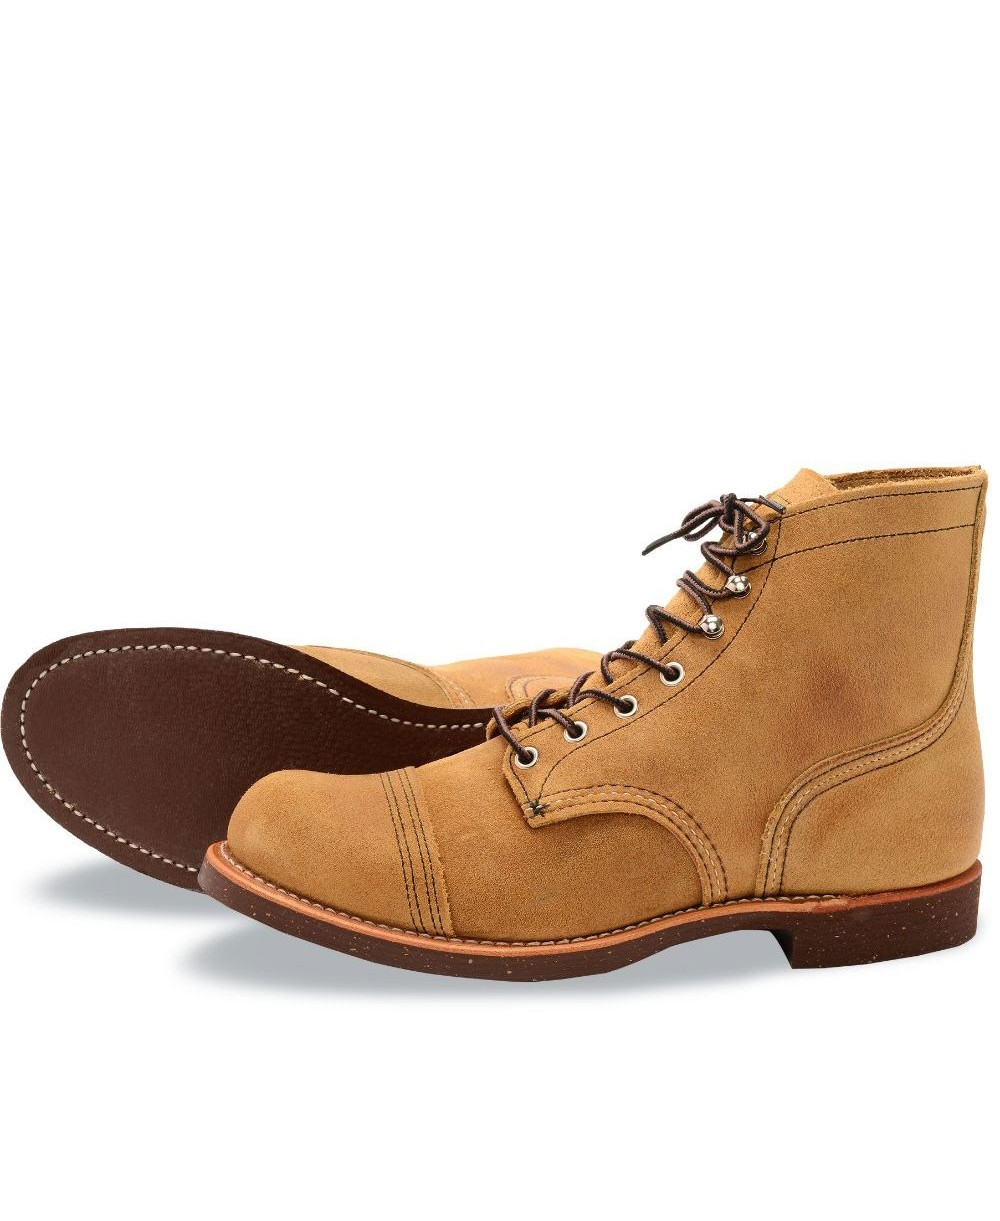 fa28f4fe1 Iron Ranger Boots en Cuir Homme 8113